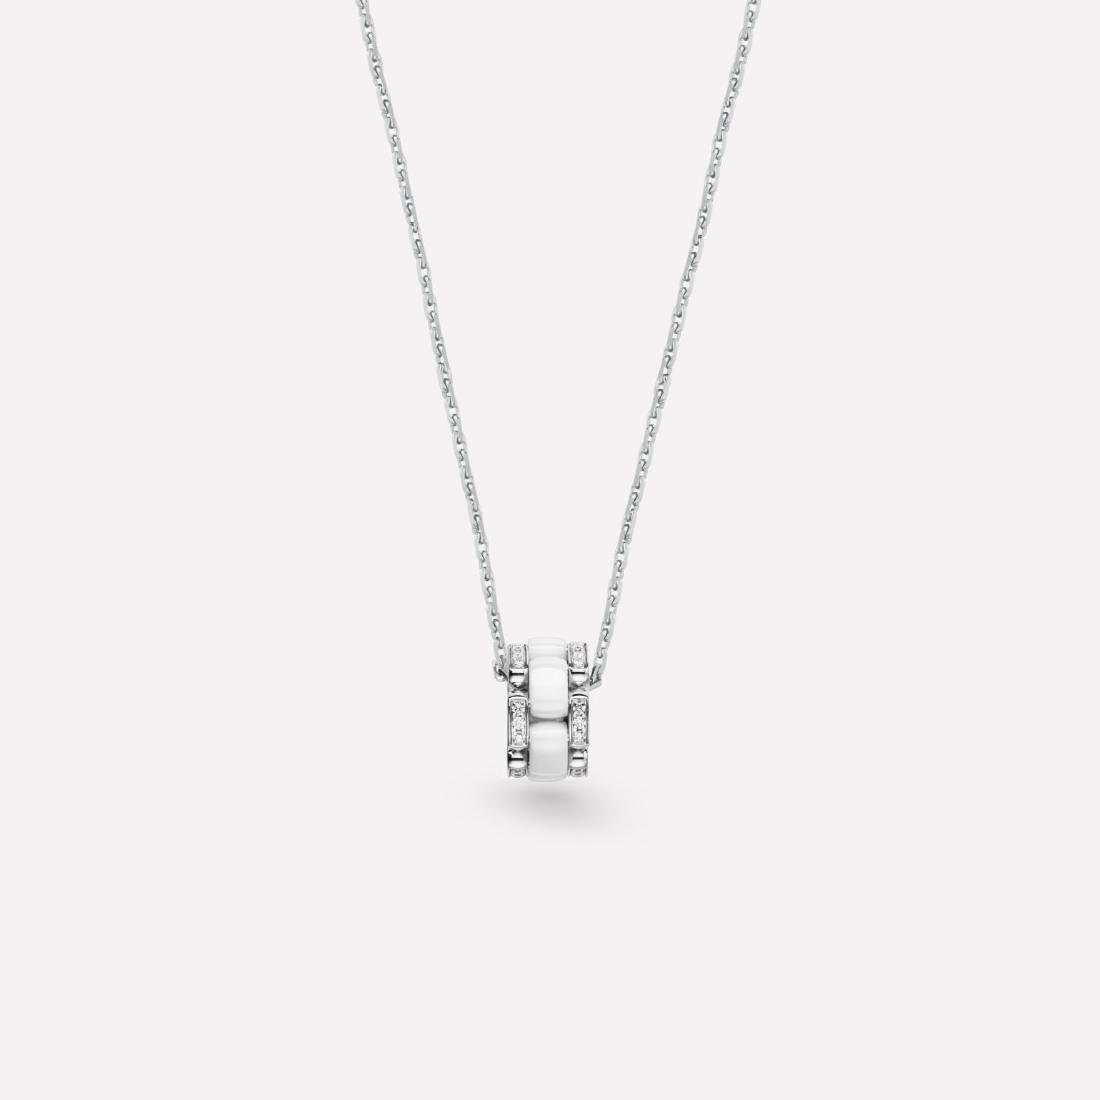 CHANEL 18K WHITE GOLD DIAMOND WHITE CERAMIC NECKLACE